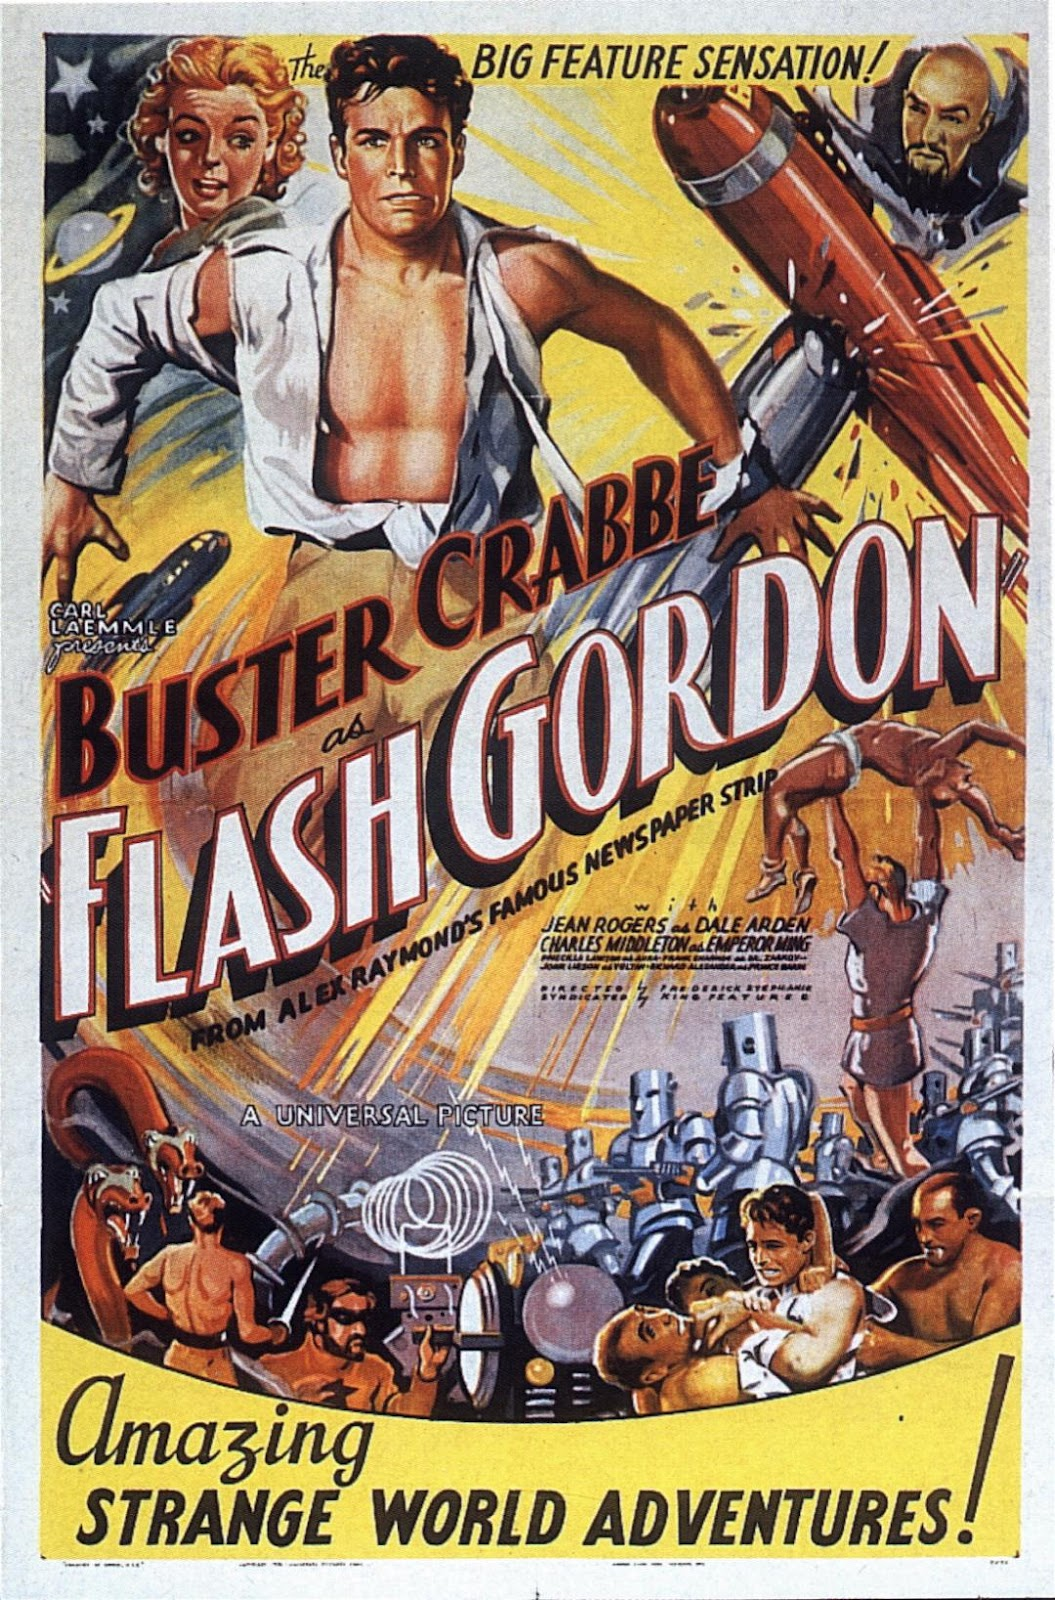 Flash Gordon Serie 1936